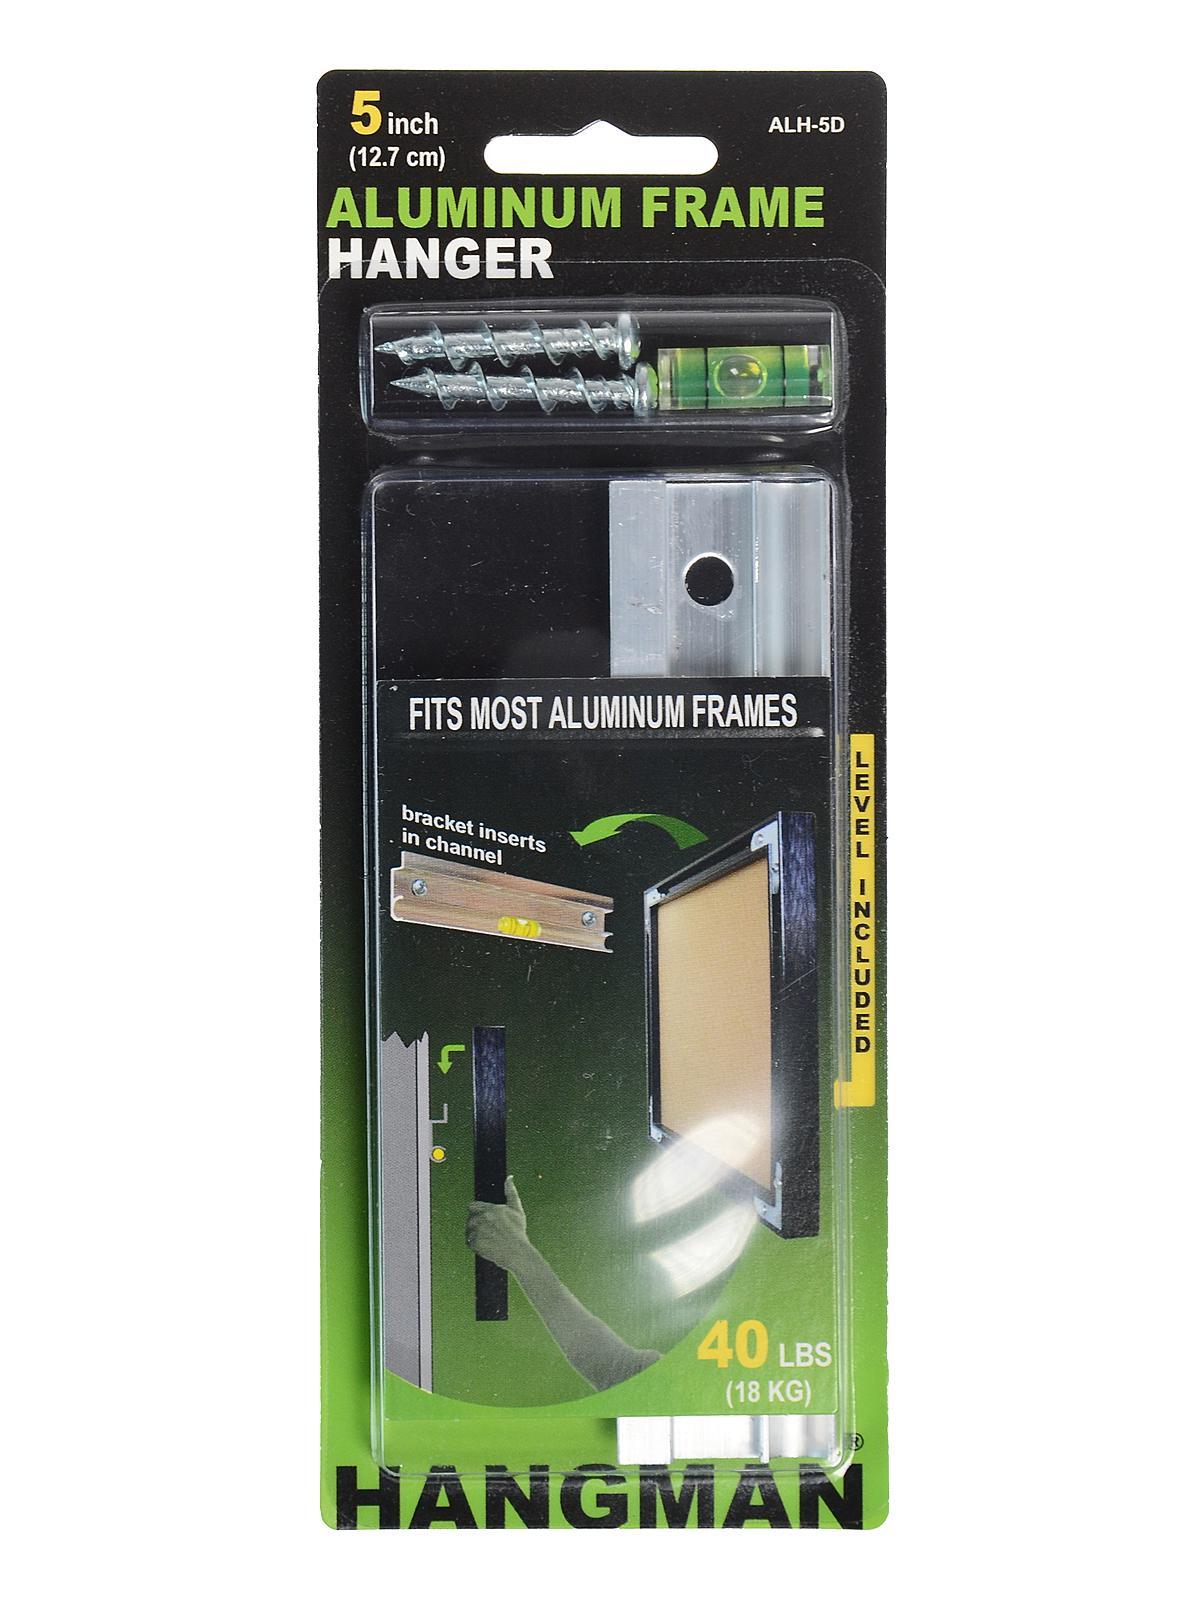 Hangman - Aluminum Frame Hanger